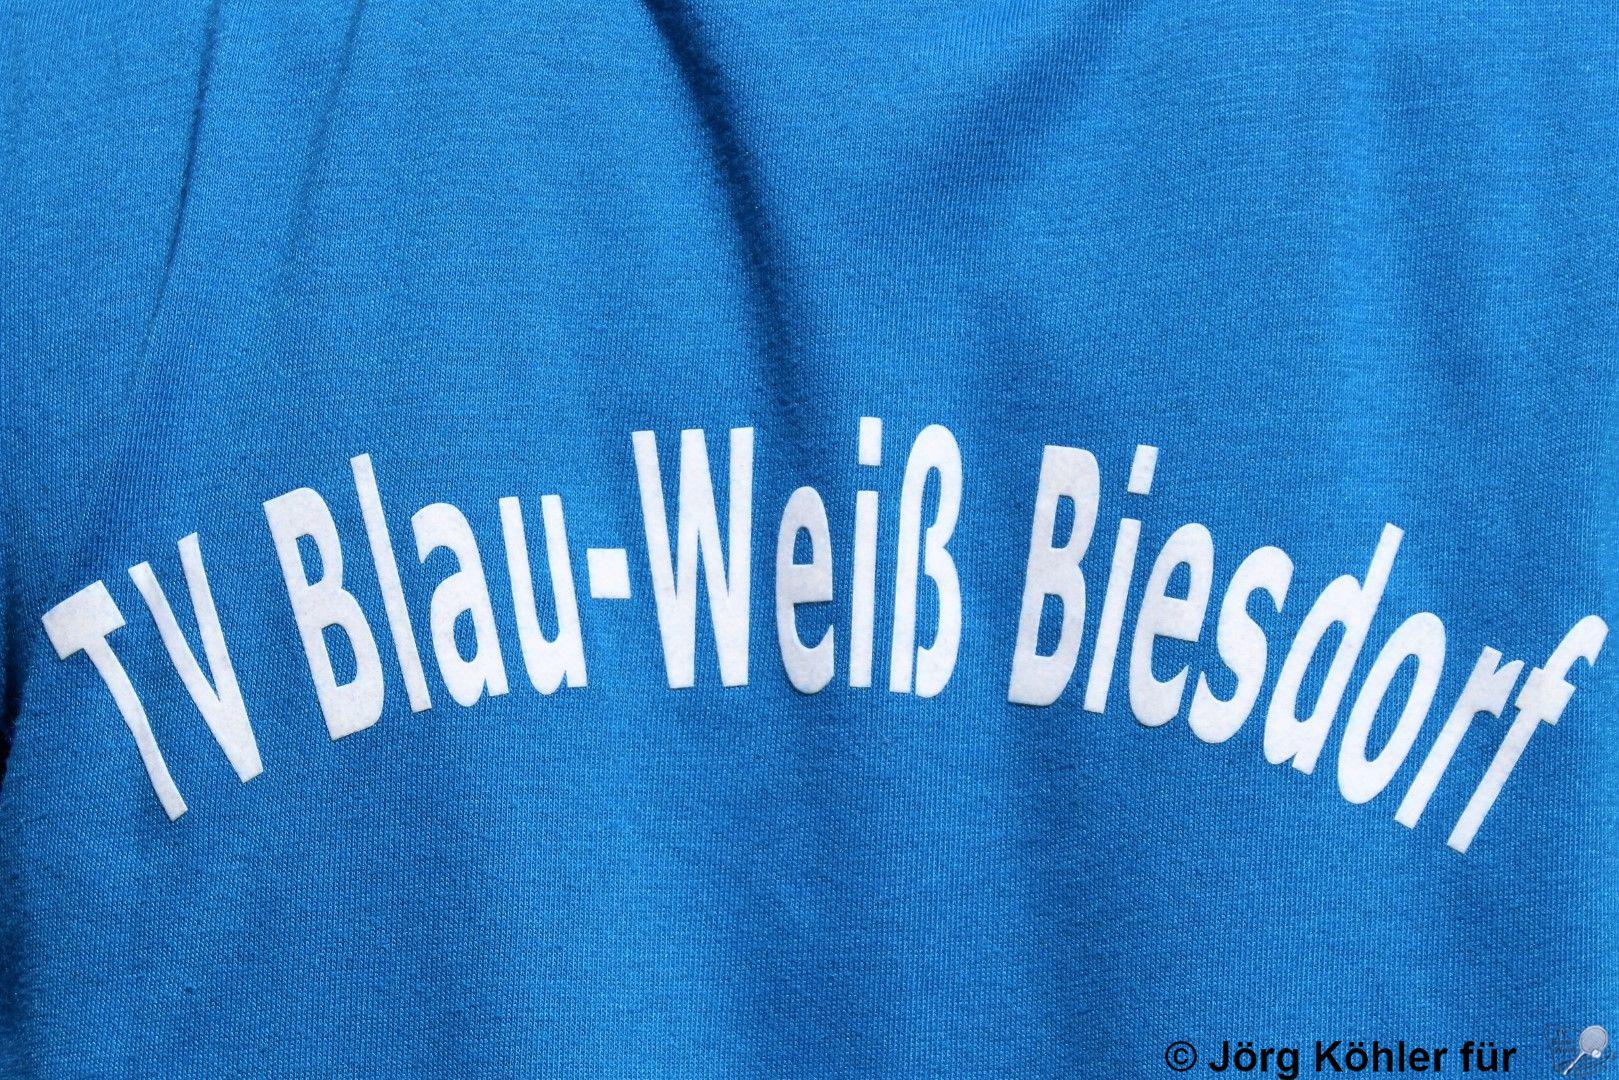 30 Jahre Blau Weiss Biesdorf e.V.